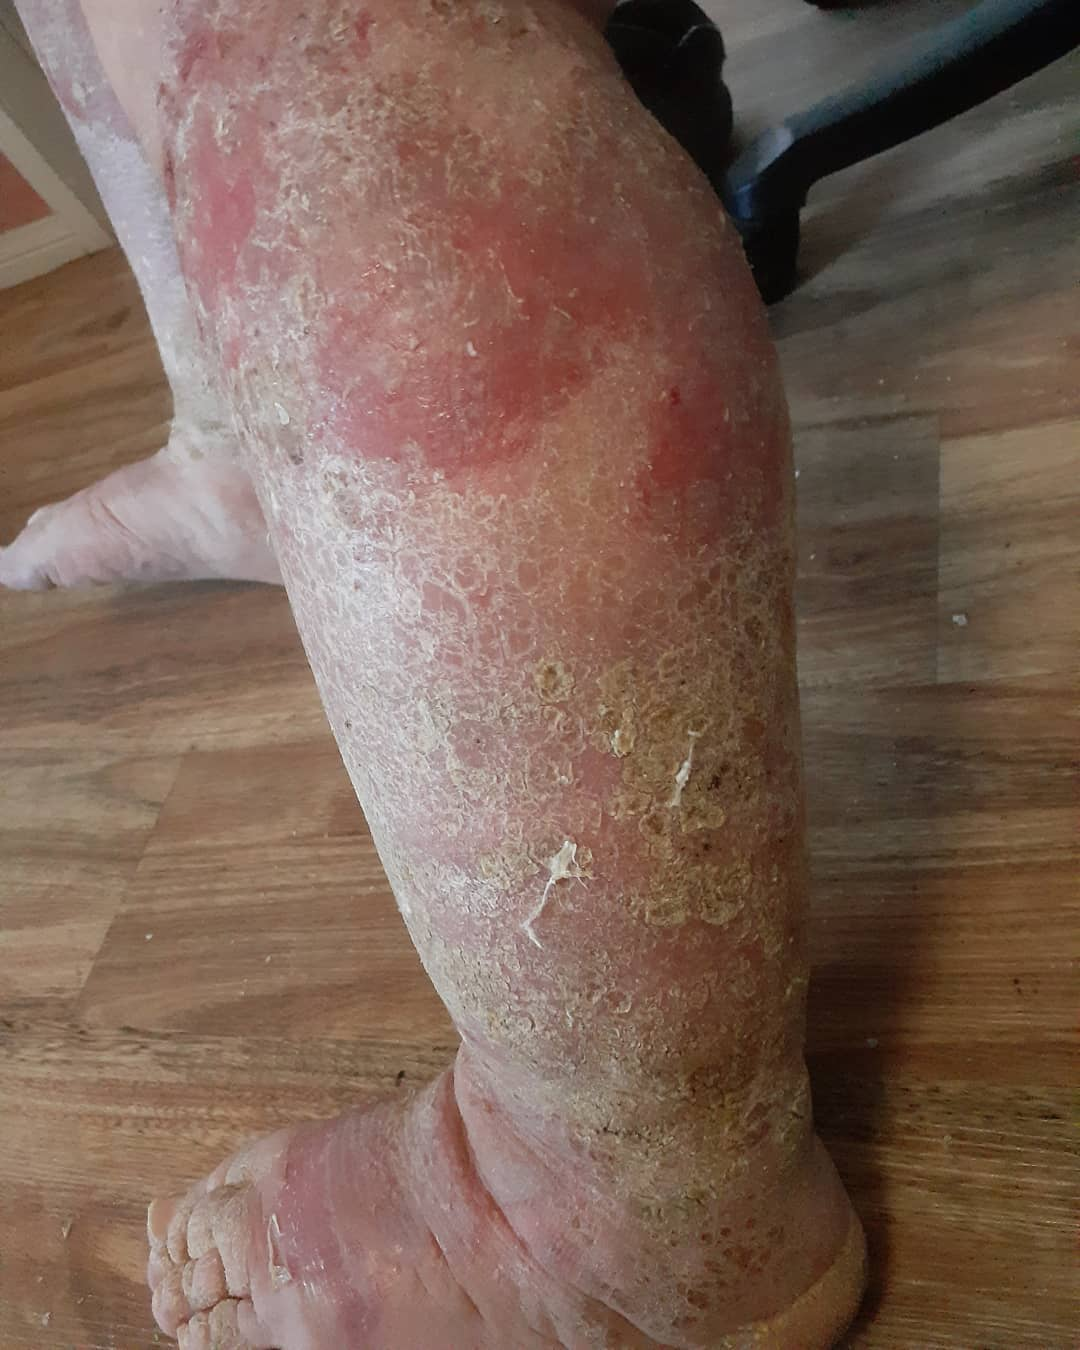 Untreated Lymphoedema